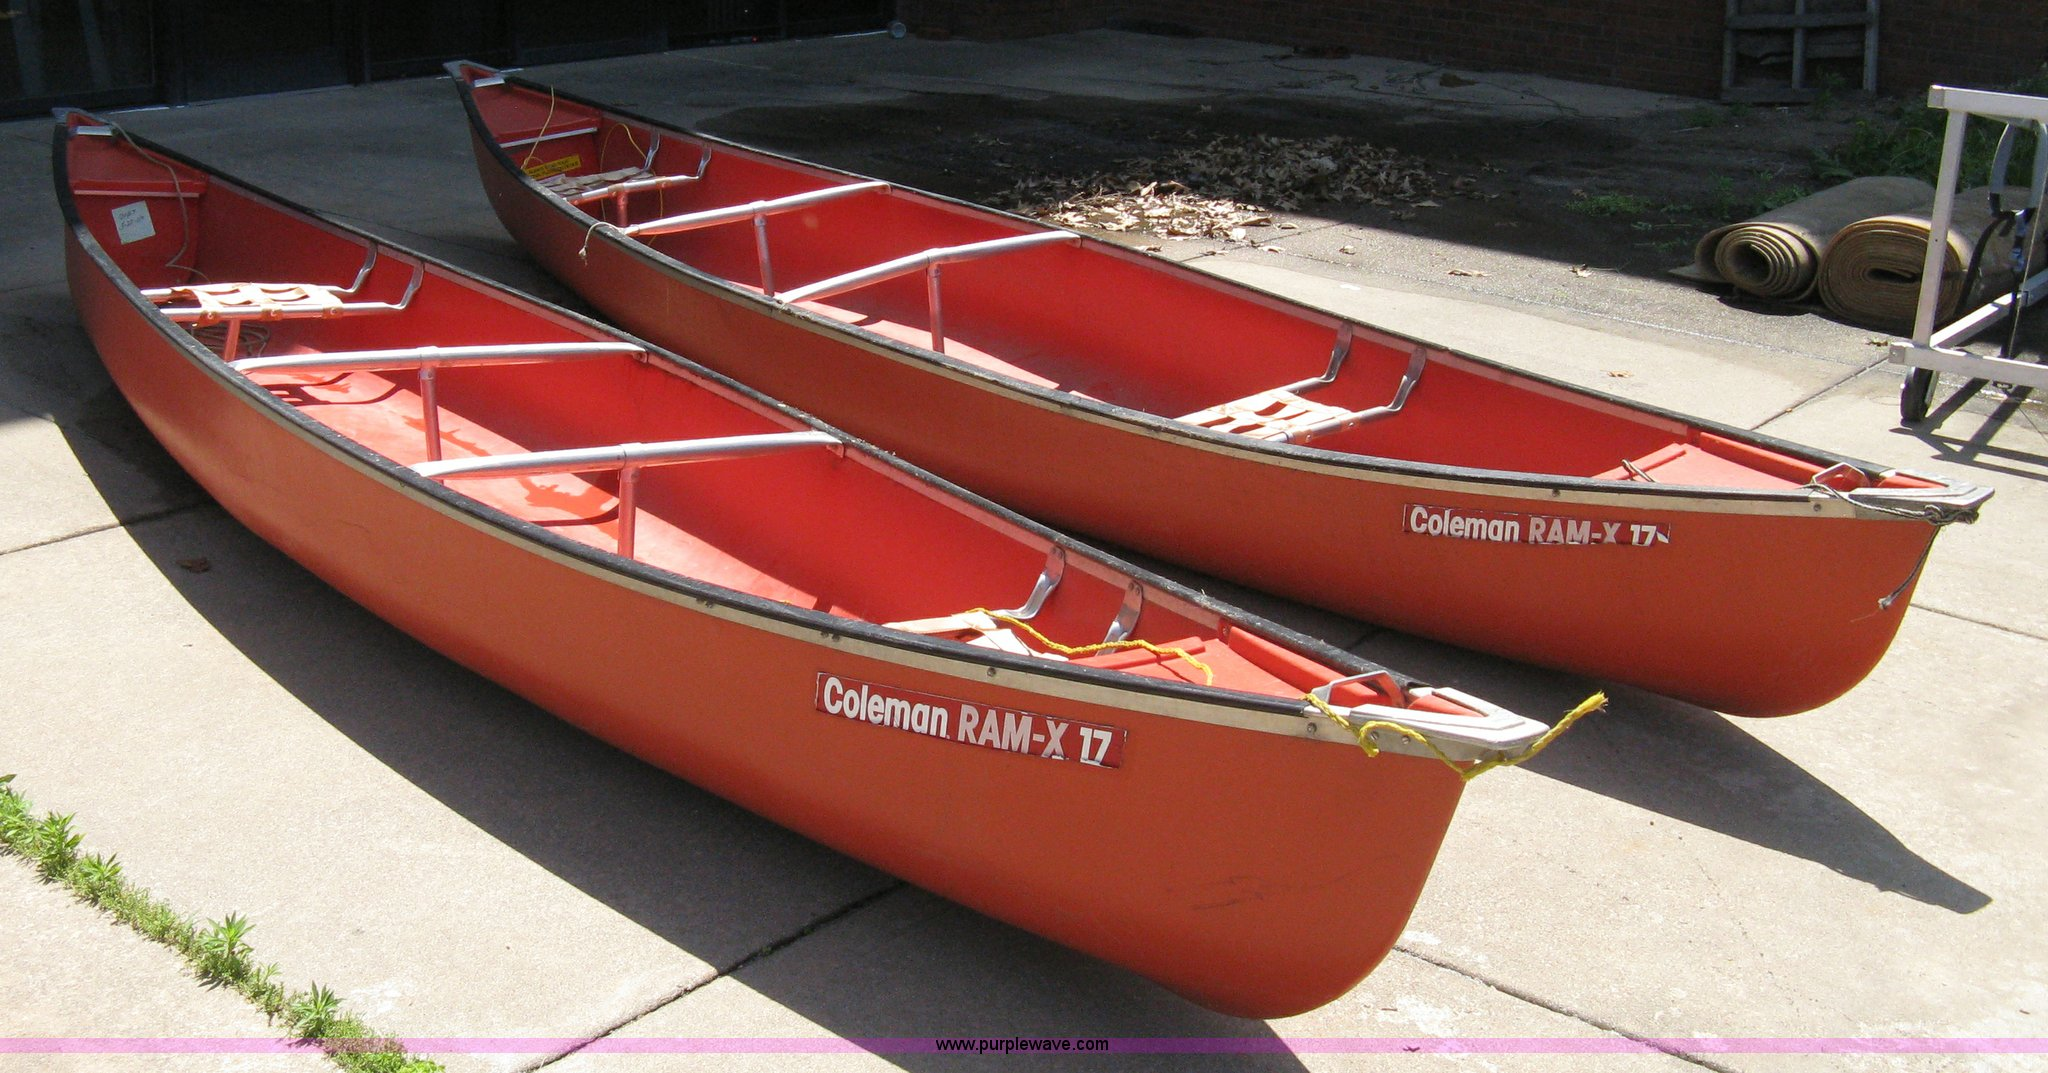 Trucks For Sale Wichita Ks >> (2) Coleman Ram-X17 canoes in Wichita, KS | Item 8092 sold | Purple Wave